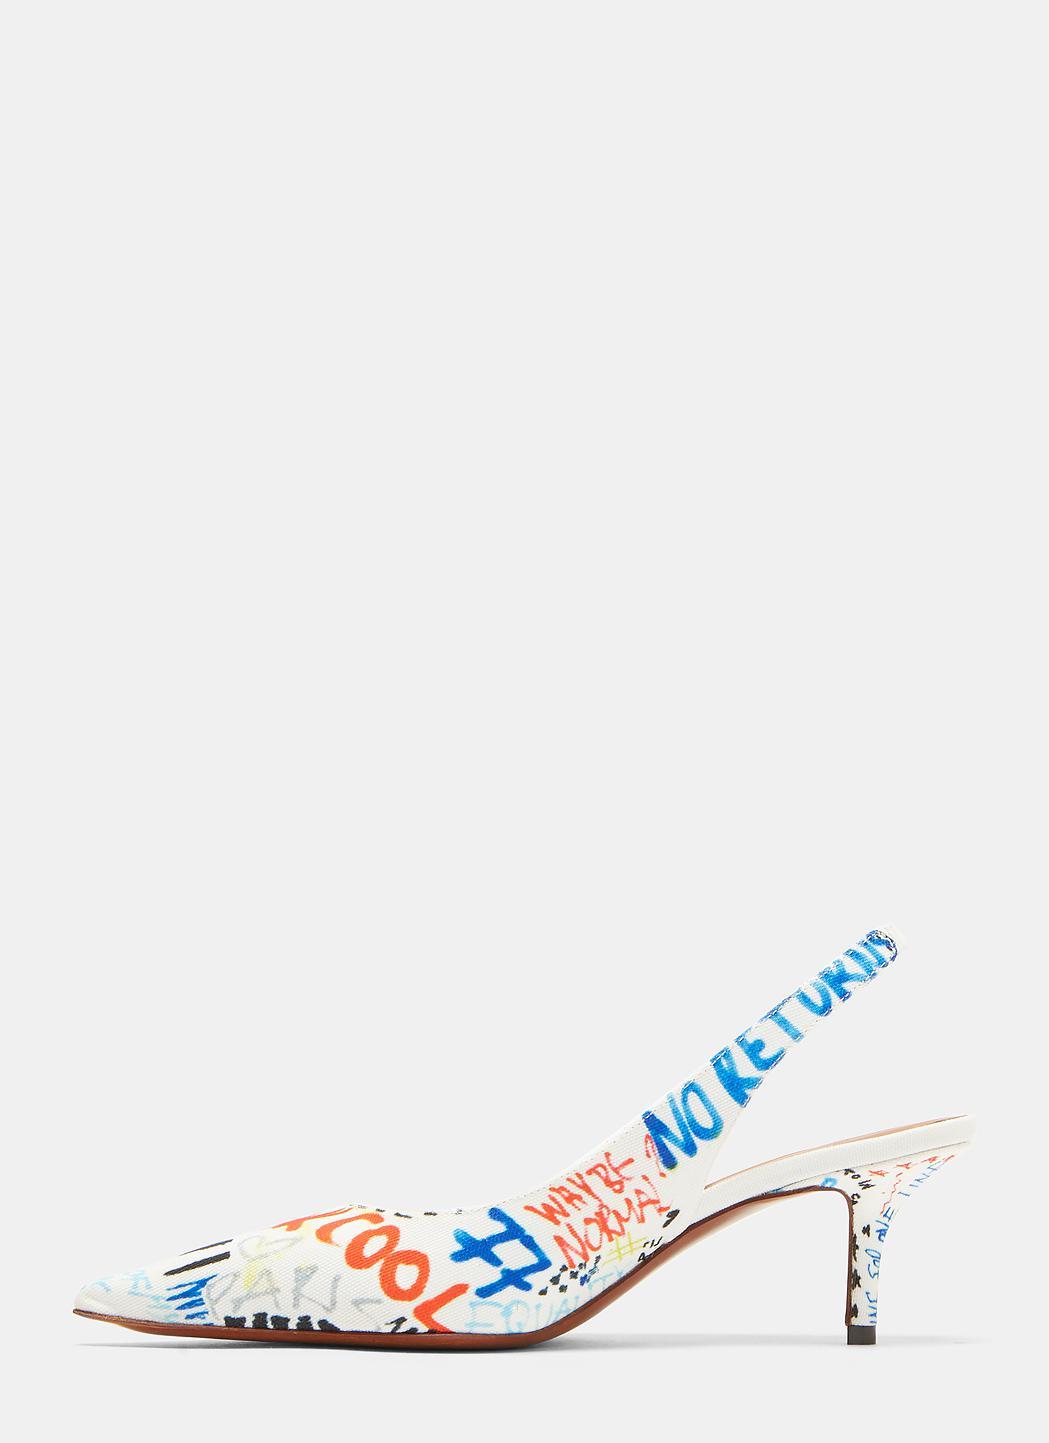 66f9cf30410 Lyst - Vetements Graffiti Print Sling Back Heels In White in White